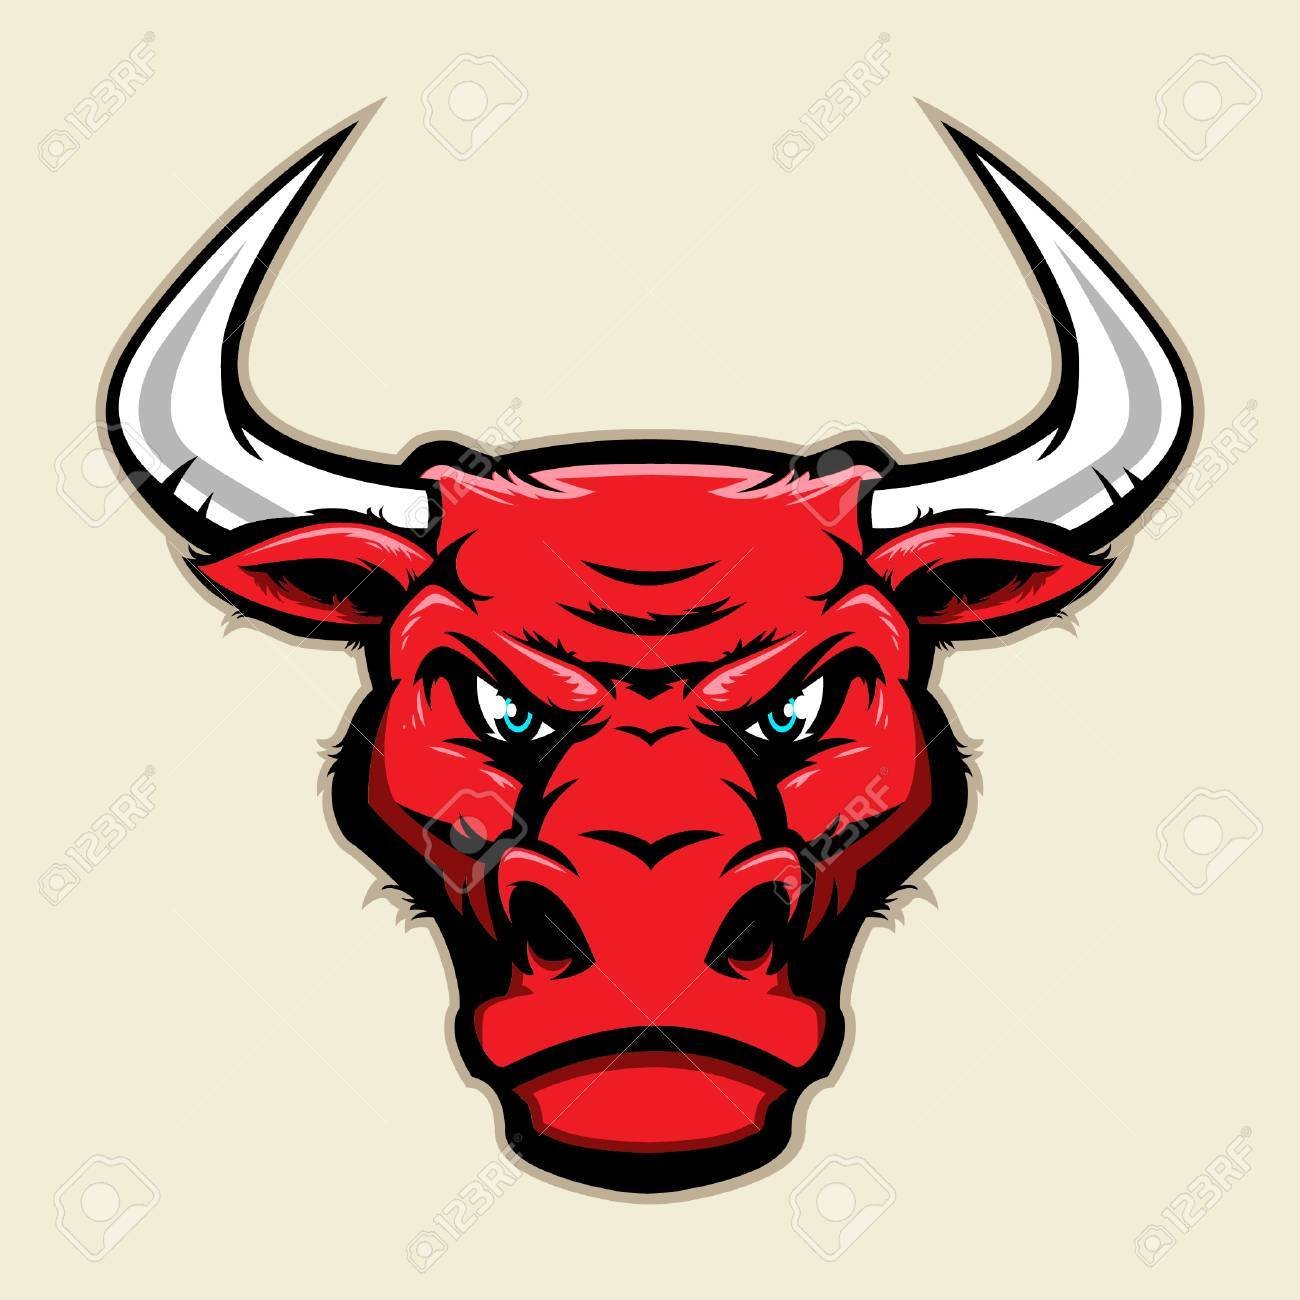 Angry bull head mascot.